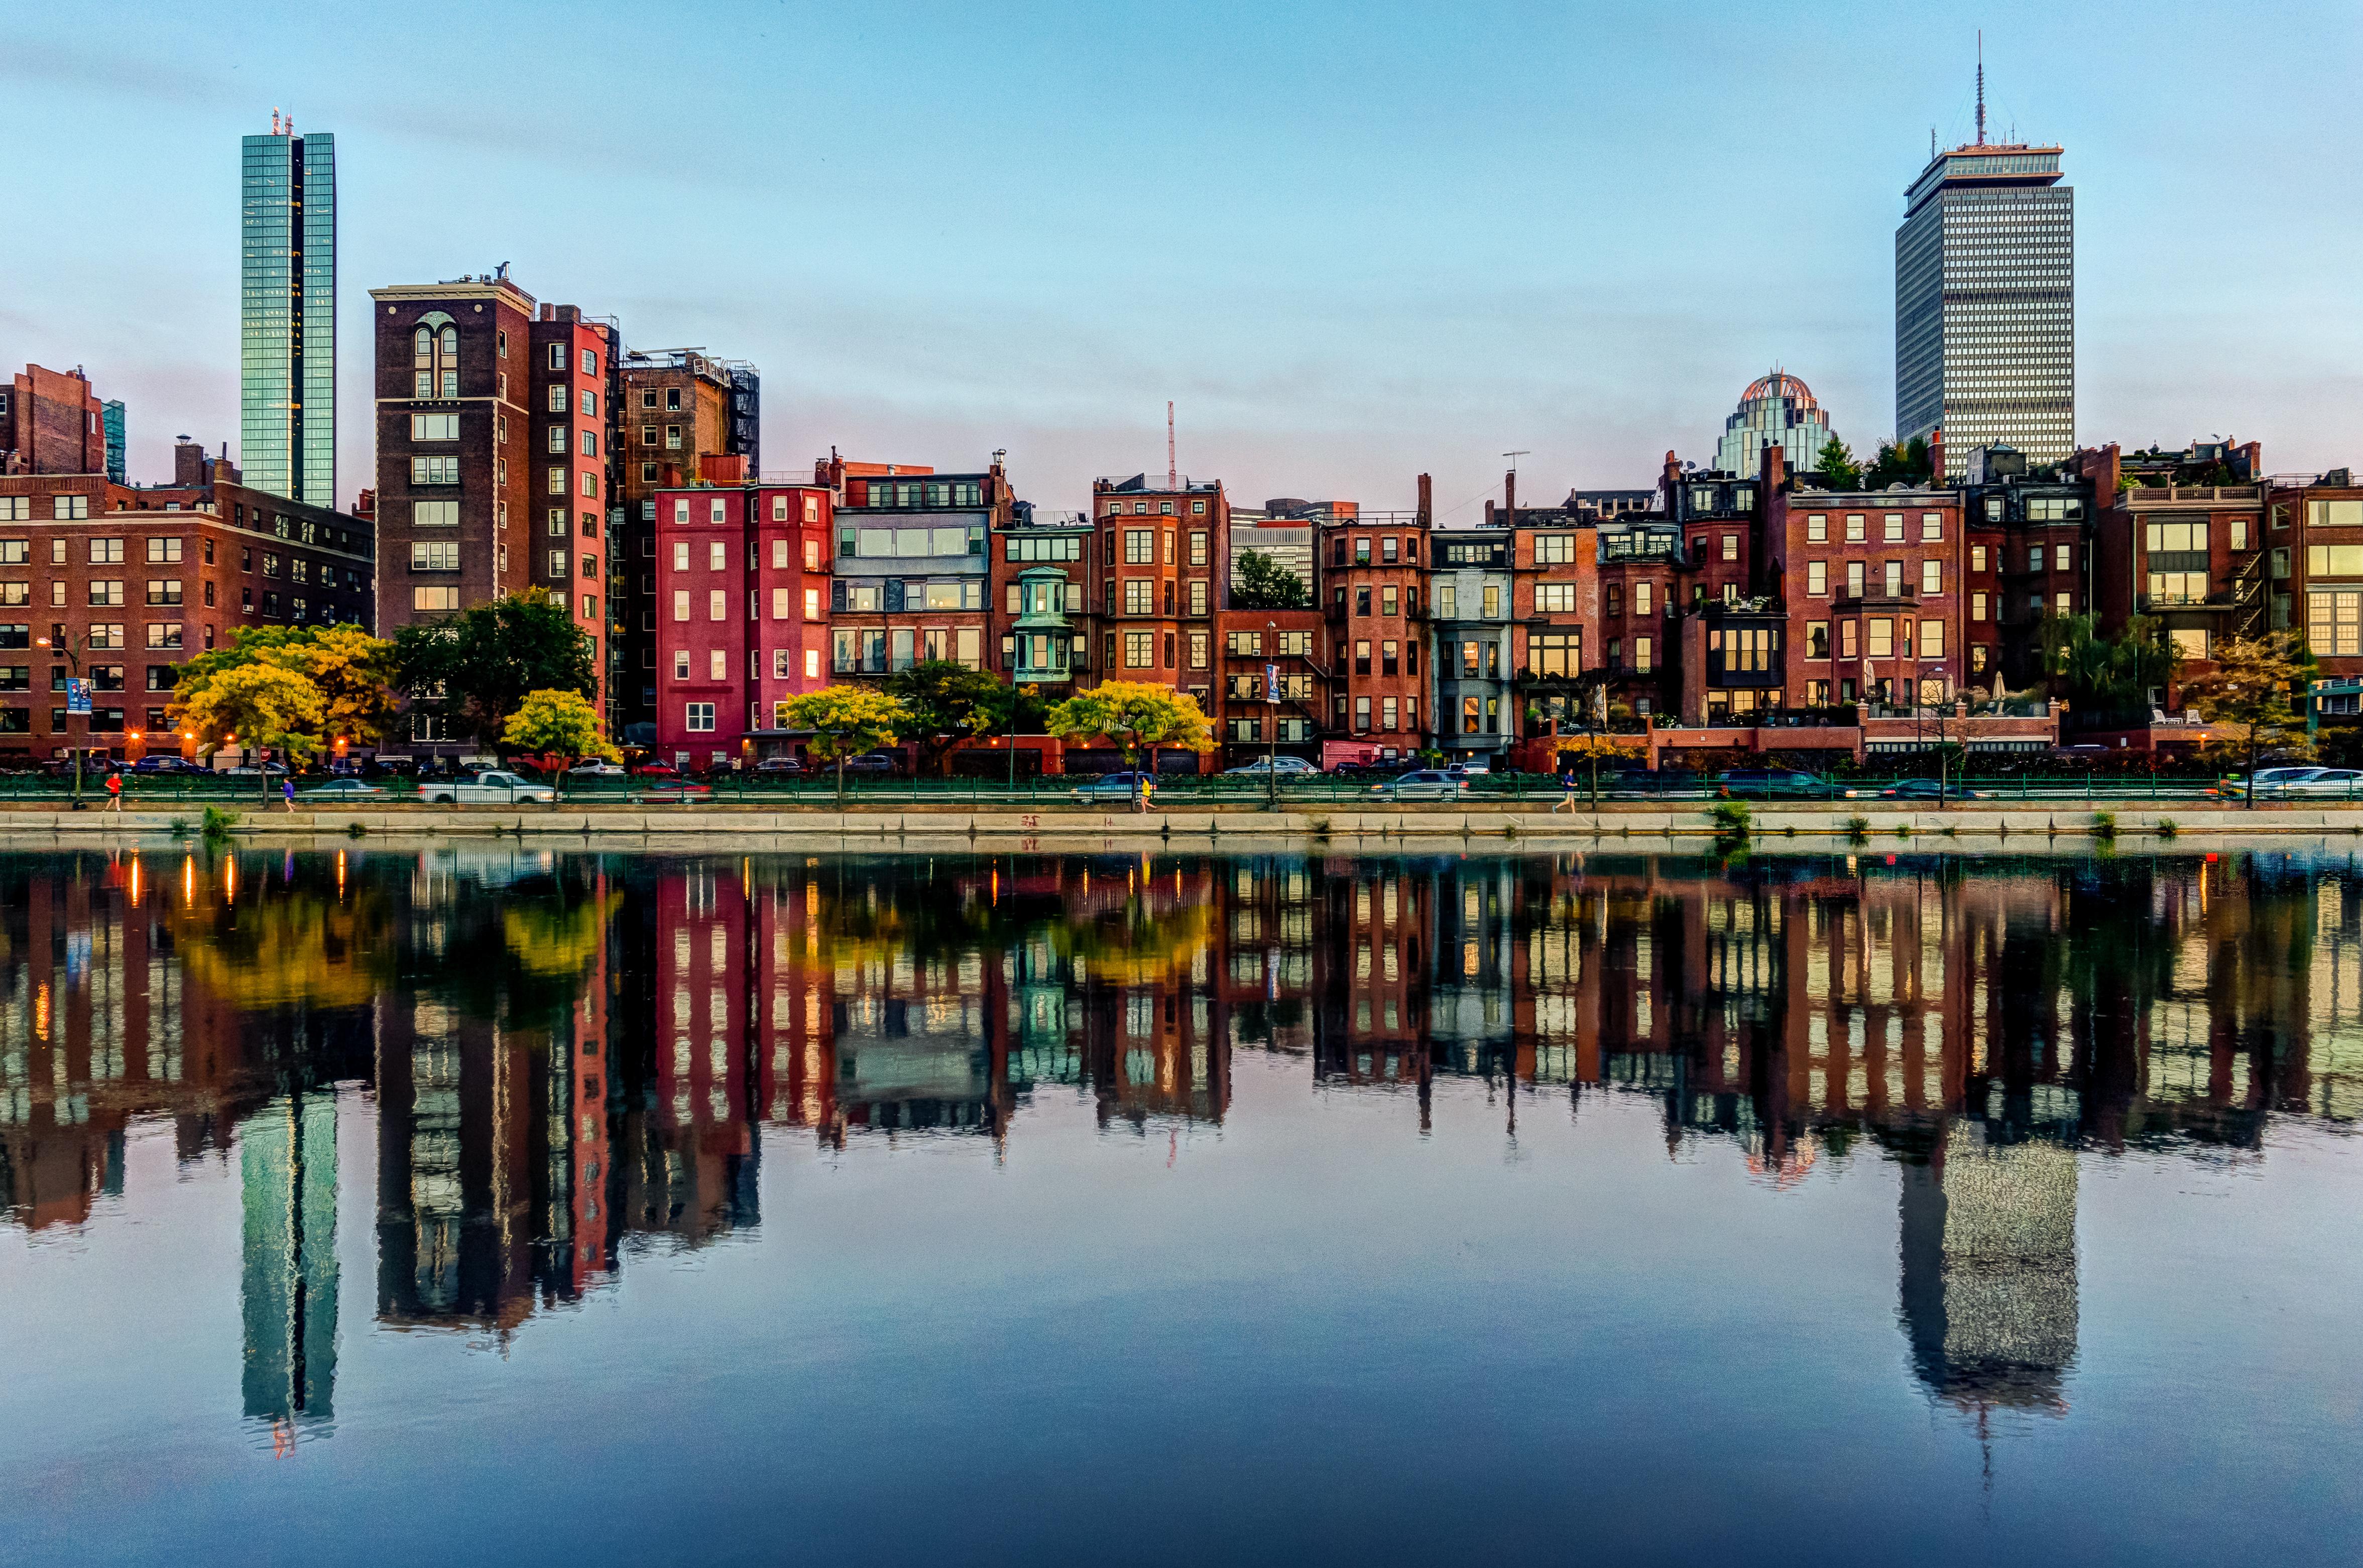 http://upload.wikimedia.org/wikipedia/commons/1/17/Boston_Back_Bay_reflection.jpg